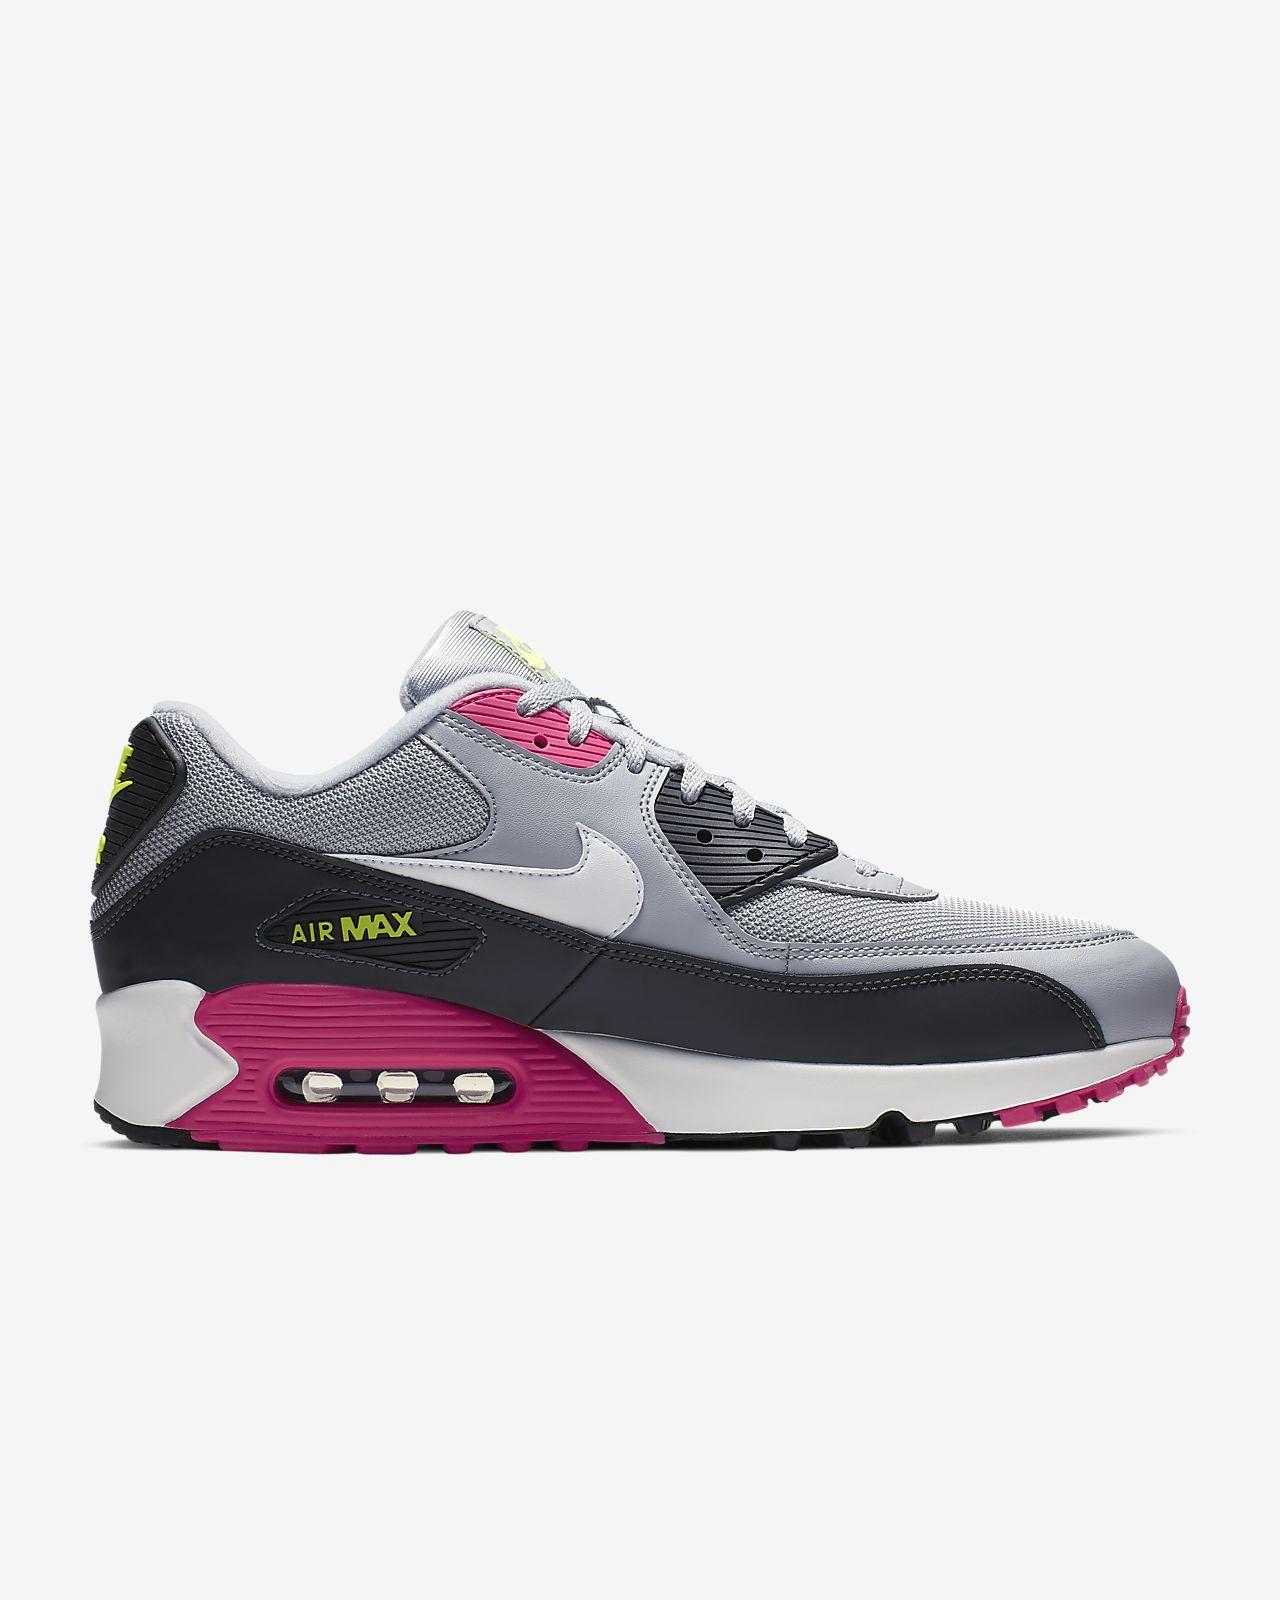 cheap for discount 27b4c 5d492 ... Chaussure Nike Air Max 90 Essential pour Homme